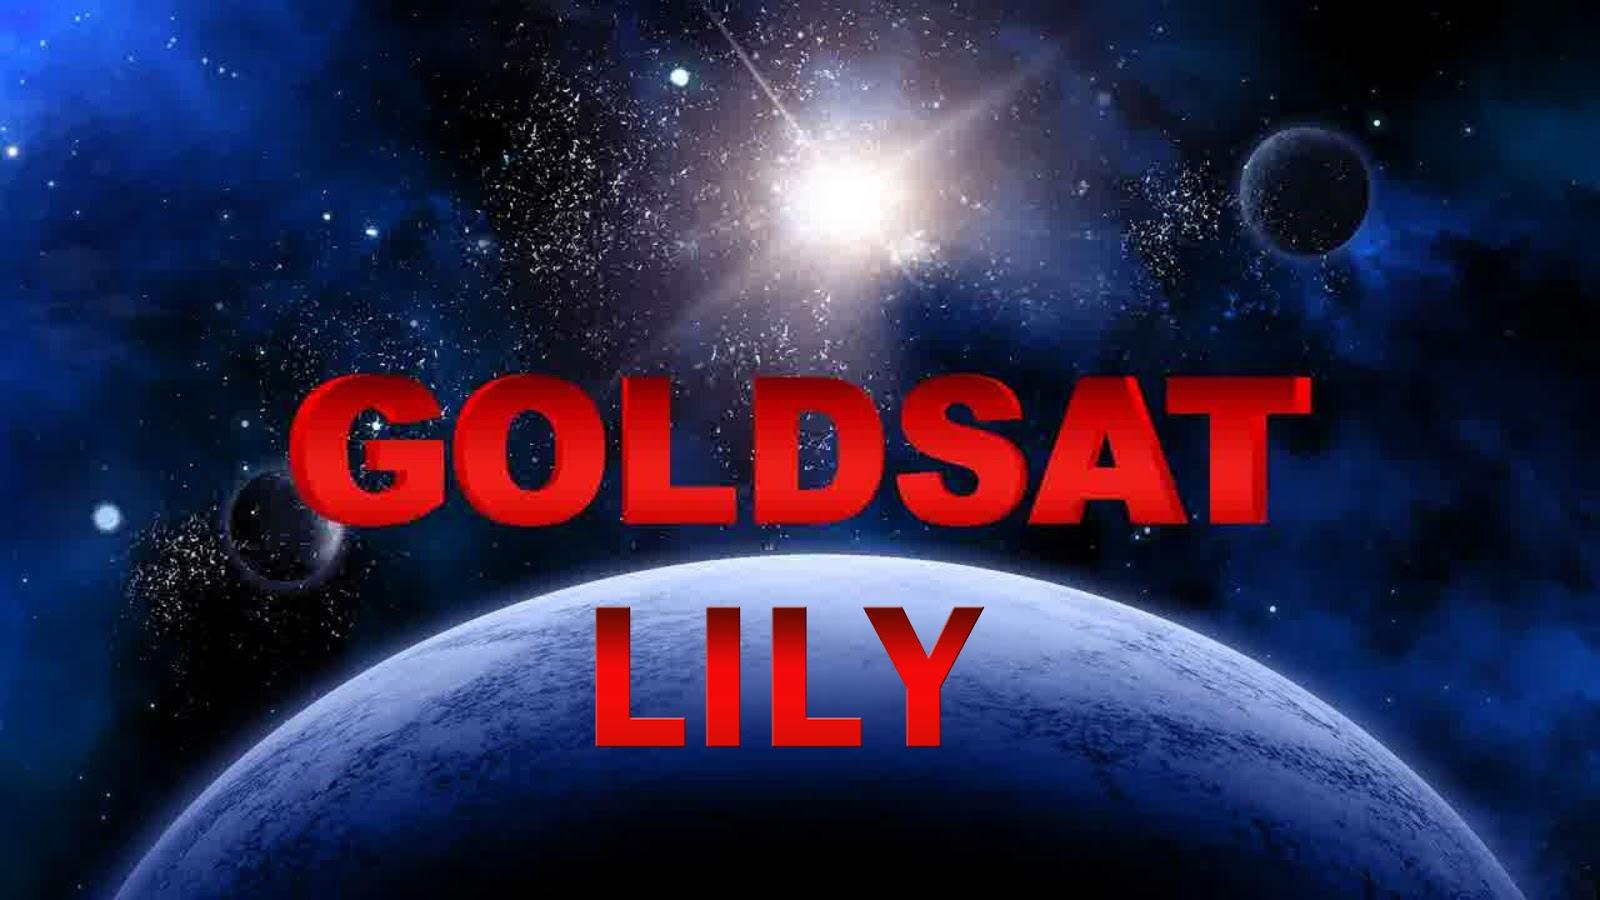 Download Firmware Receiver Goldsat Lily HD SW Update Terbaru